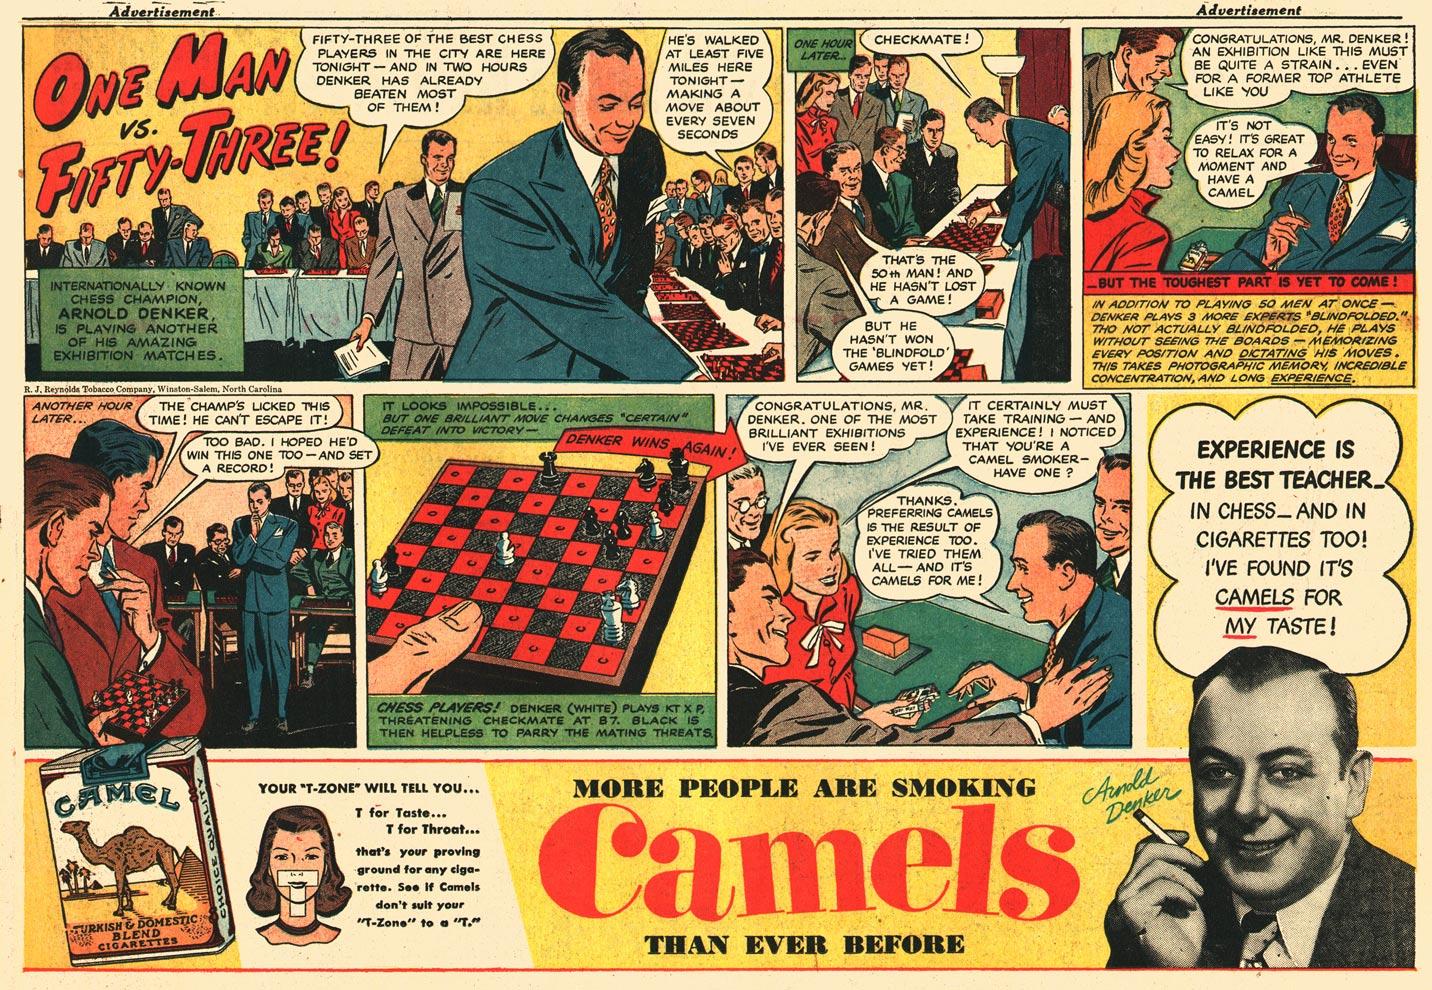 http://1.bp.blogspot.com/_P5-KXUCbsI8/TD4mEfiTbgI/AAAAAAAASjQ/-dHFLuhN0aw/s1600/Camels-Ad-1947-06-01.jpg